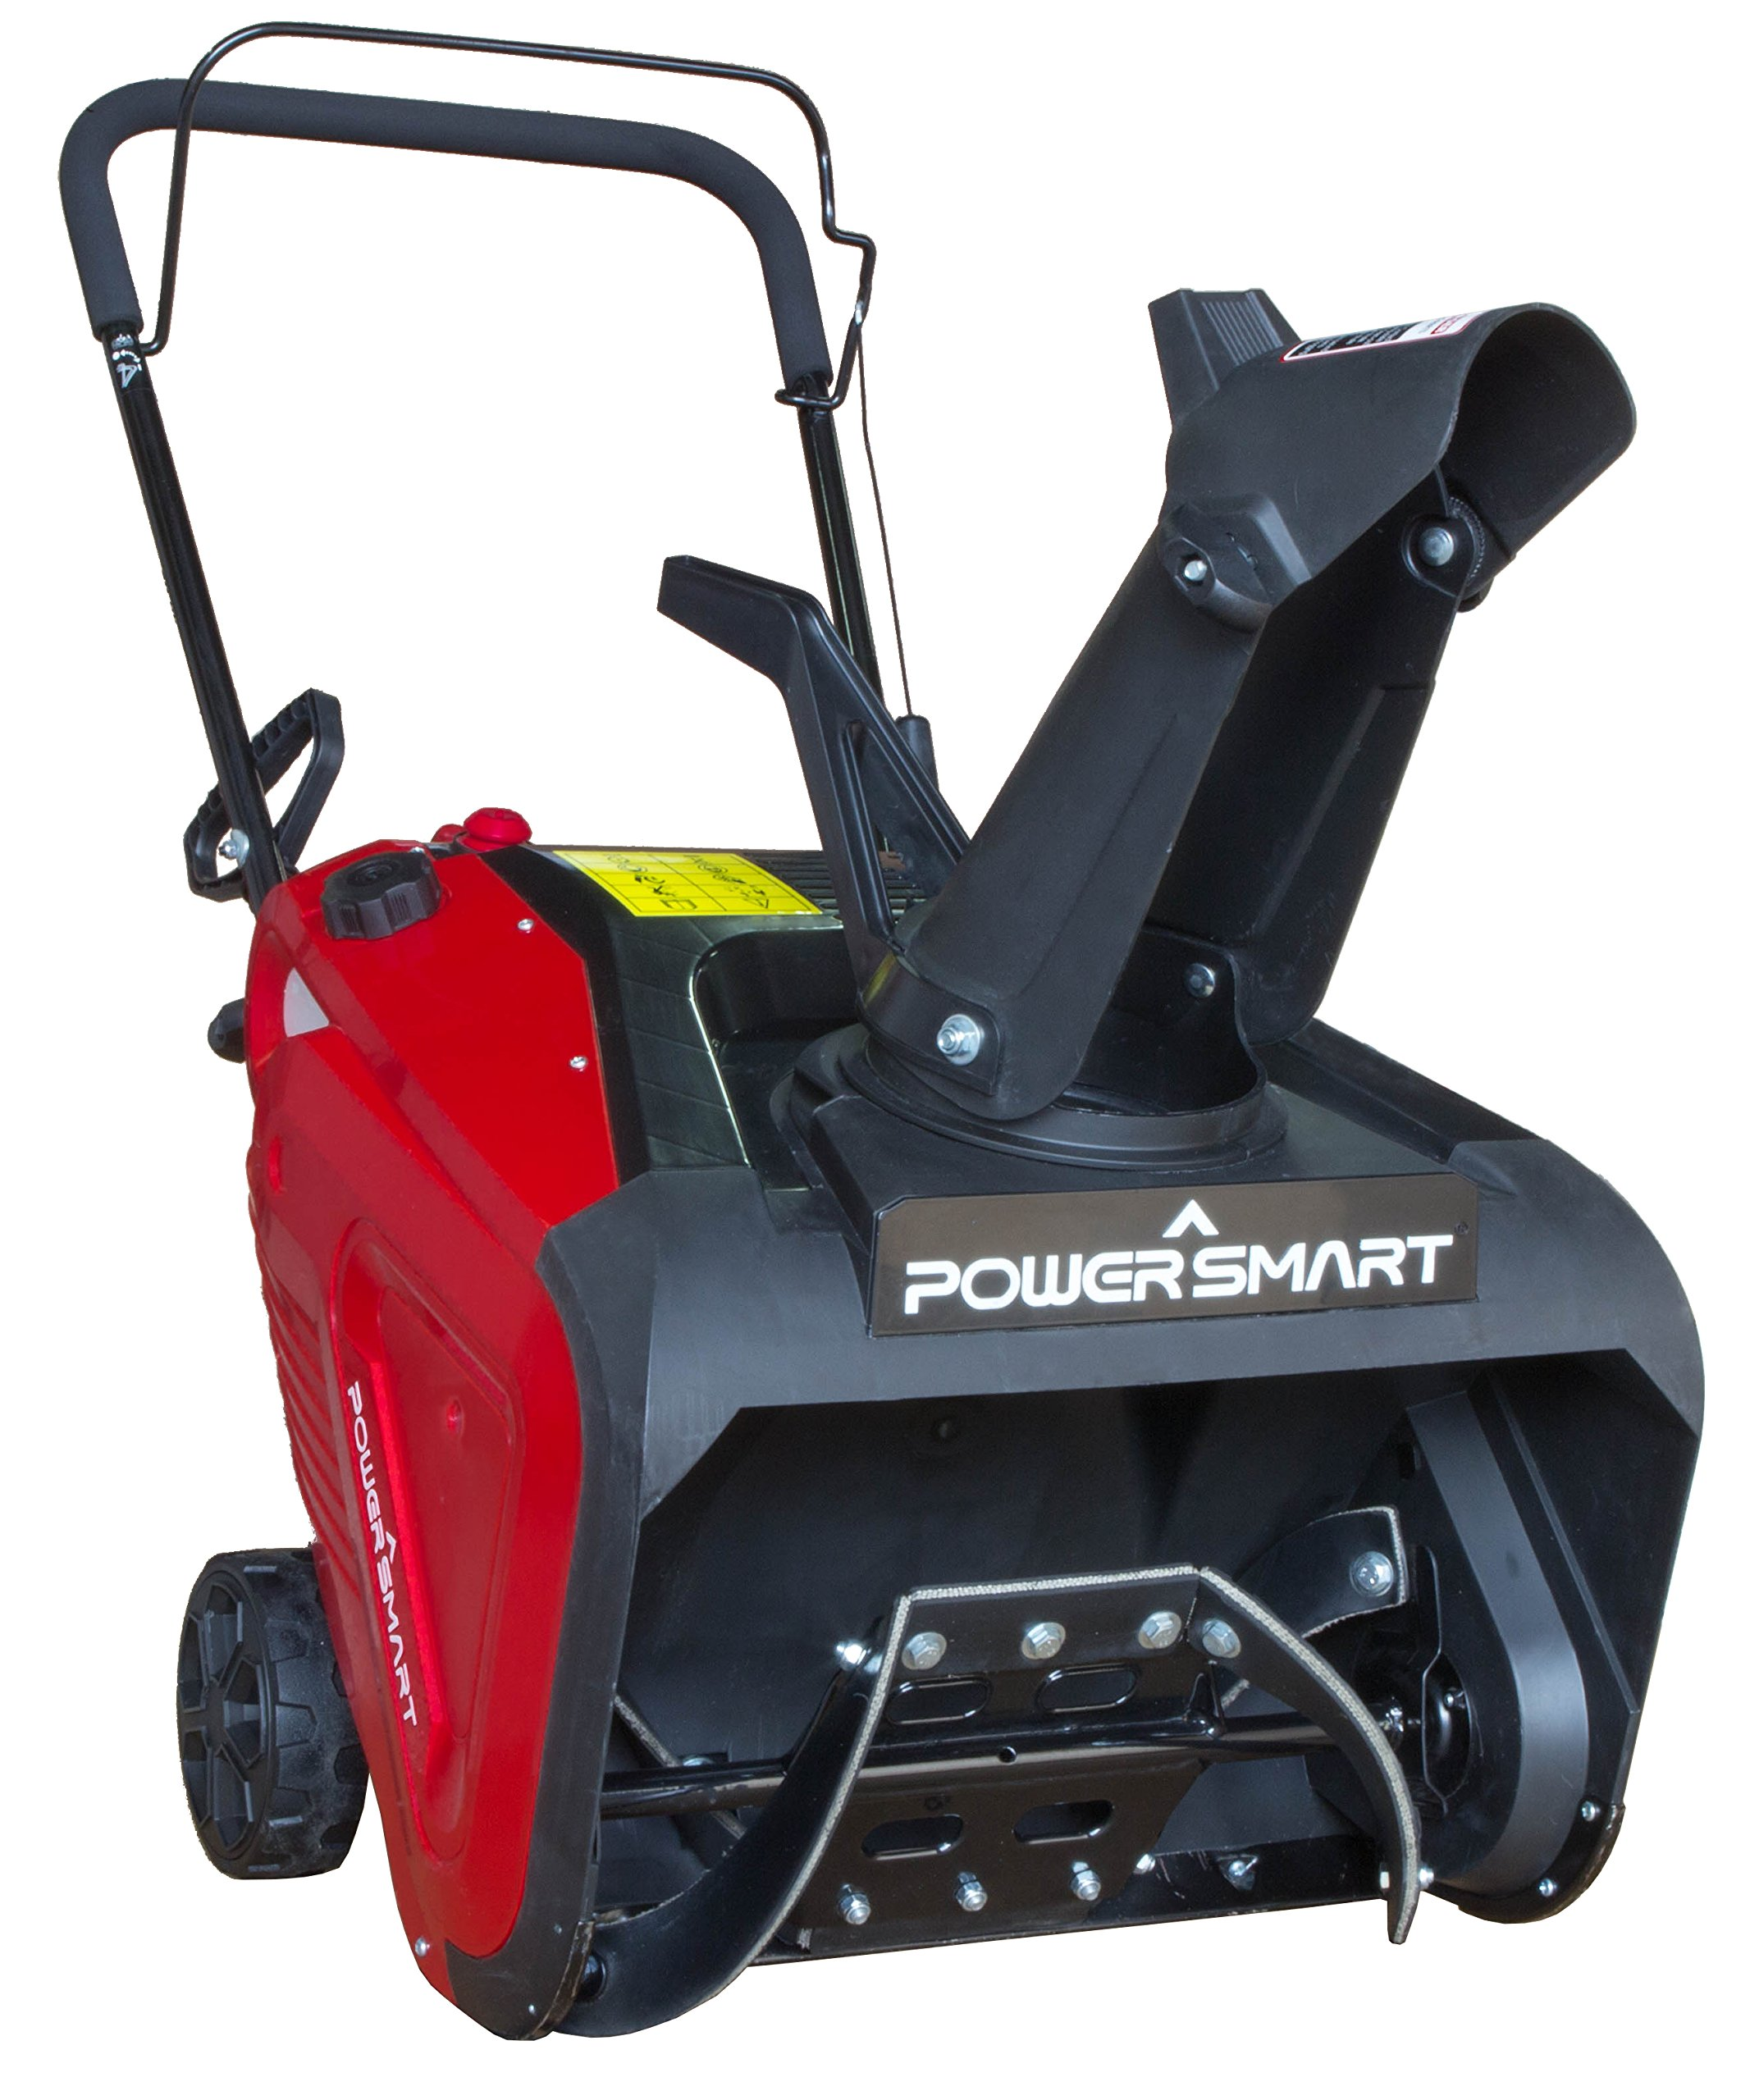 Power Smart DB7005 21 Inch 196 cc Single Stage Snow Thrower